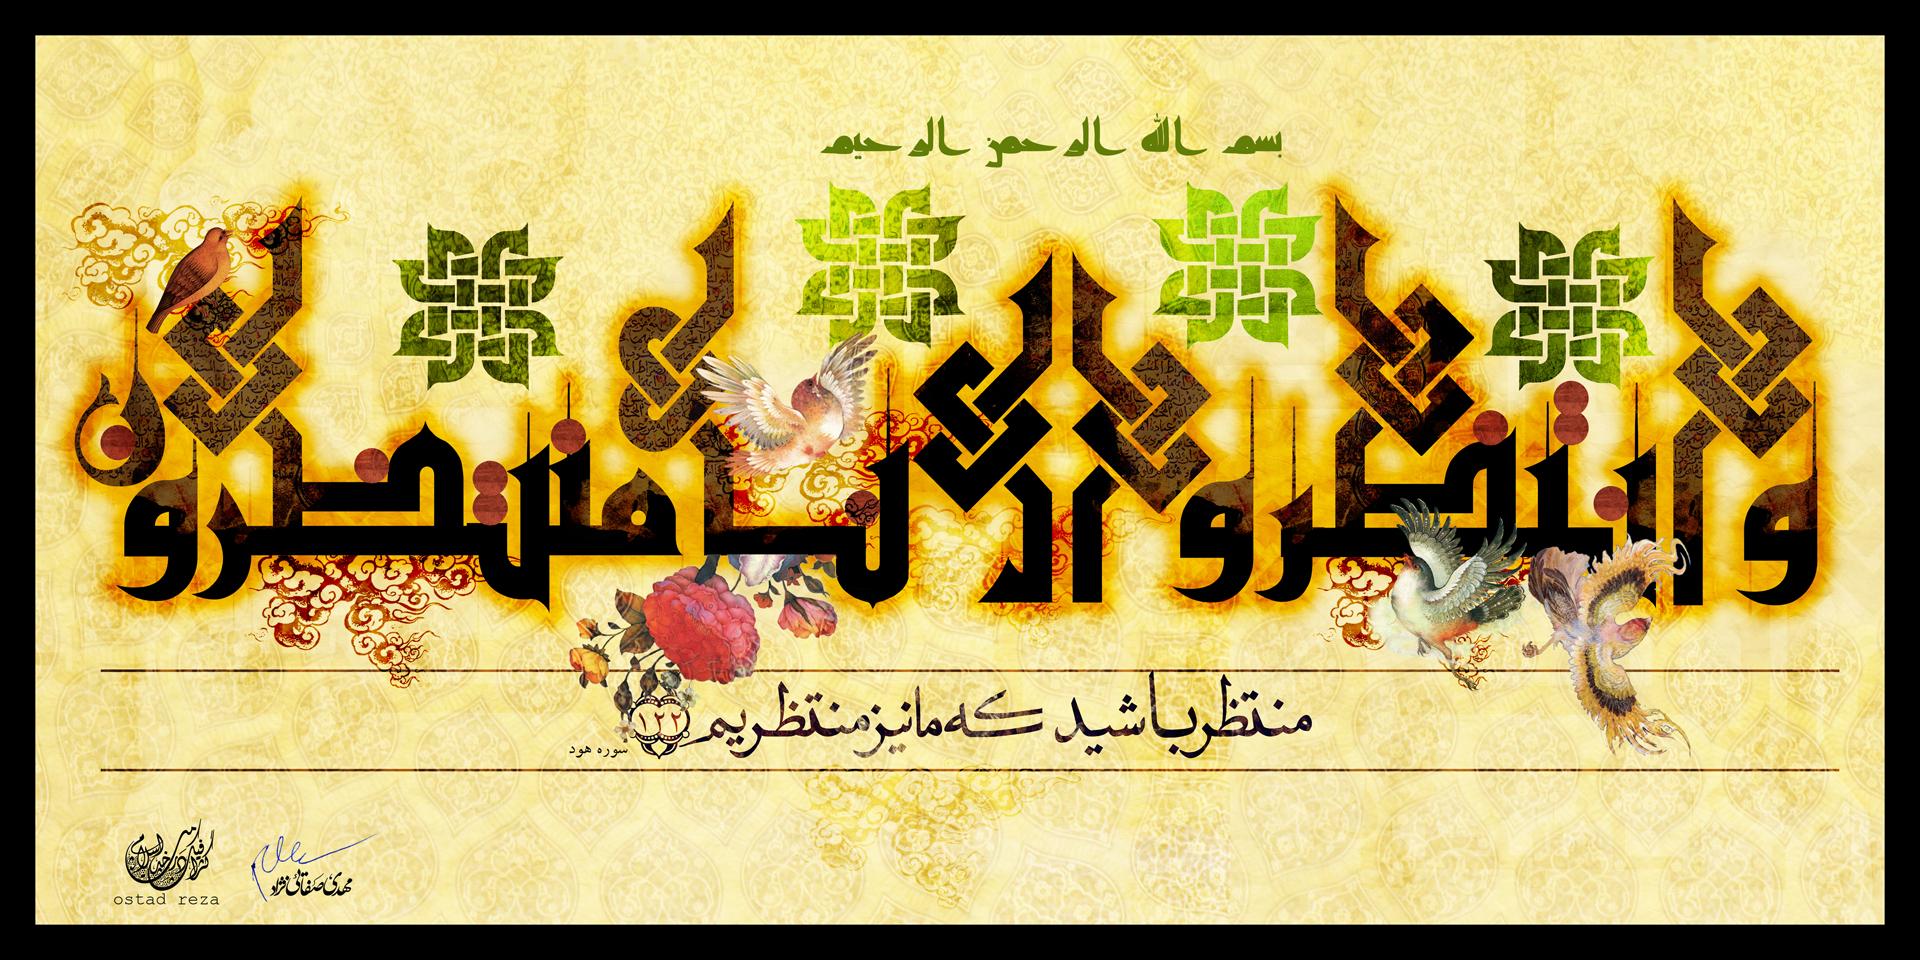 quran_by_ostadreza-d4xvfv8